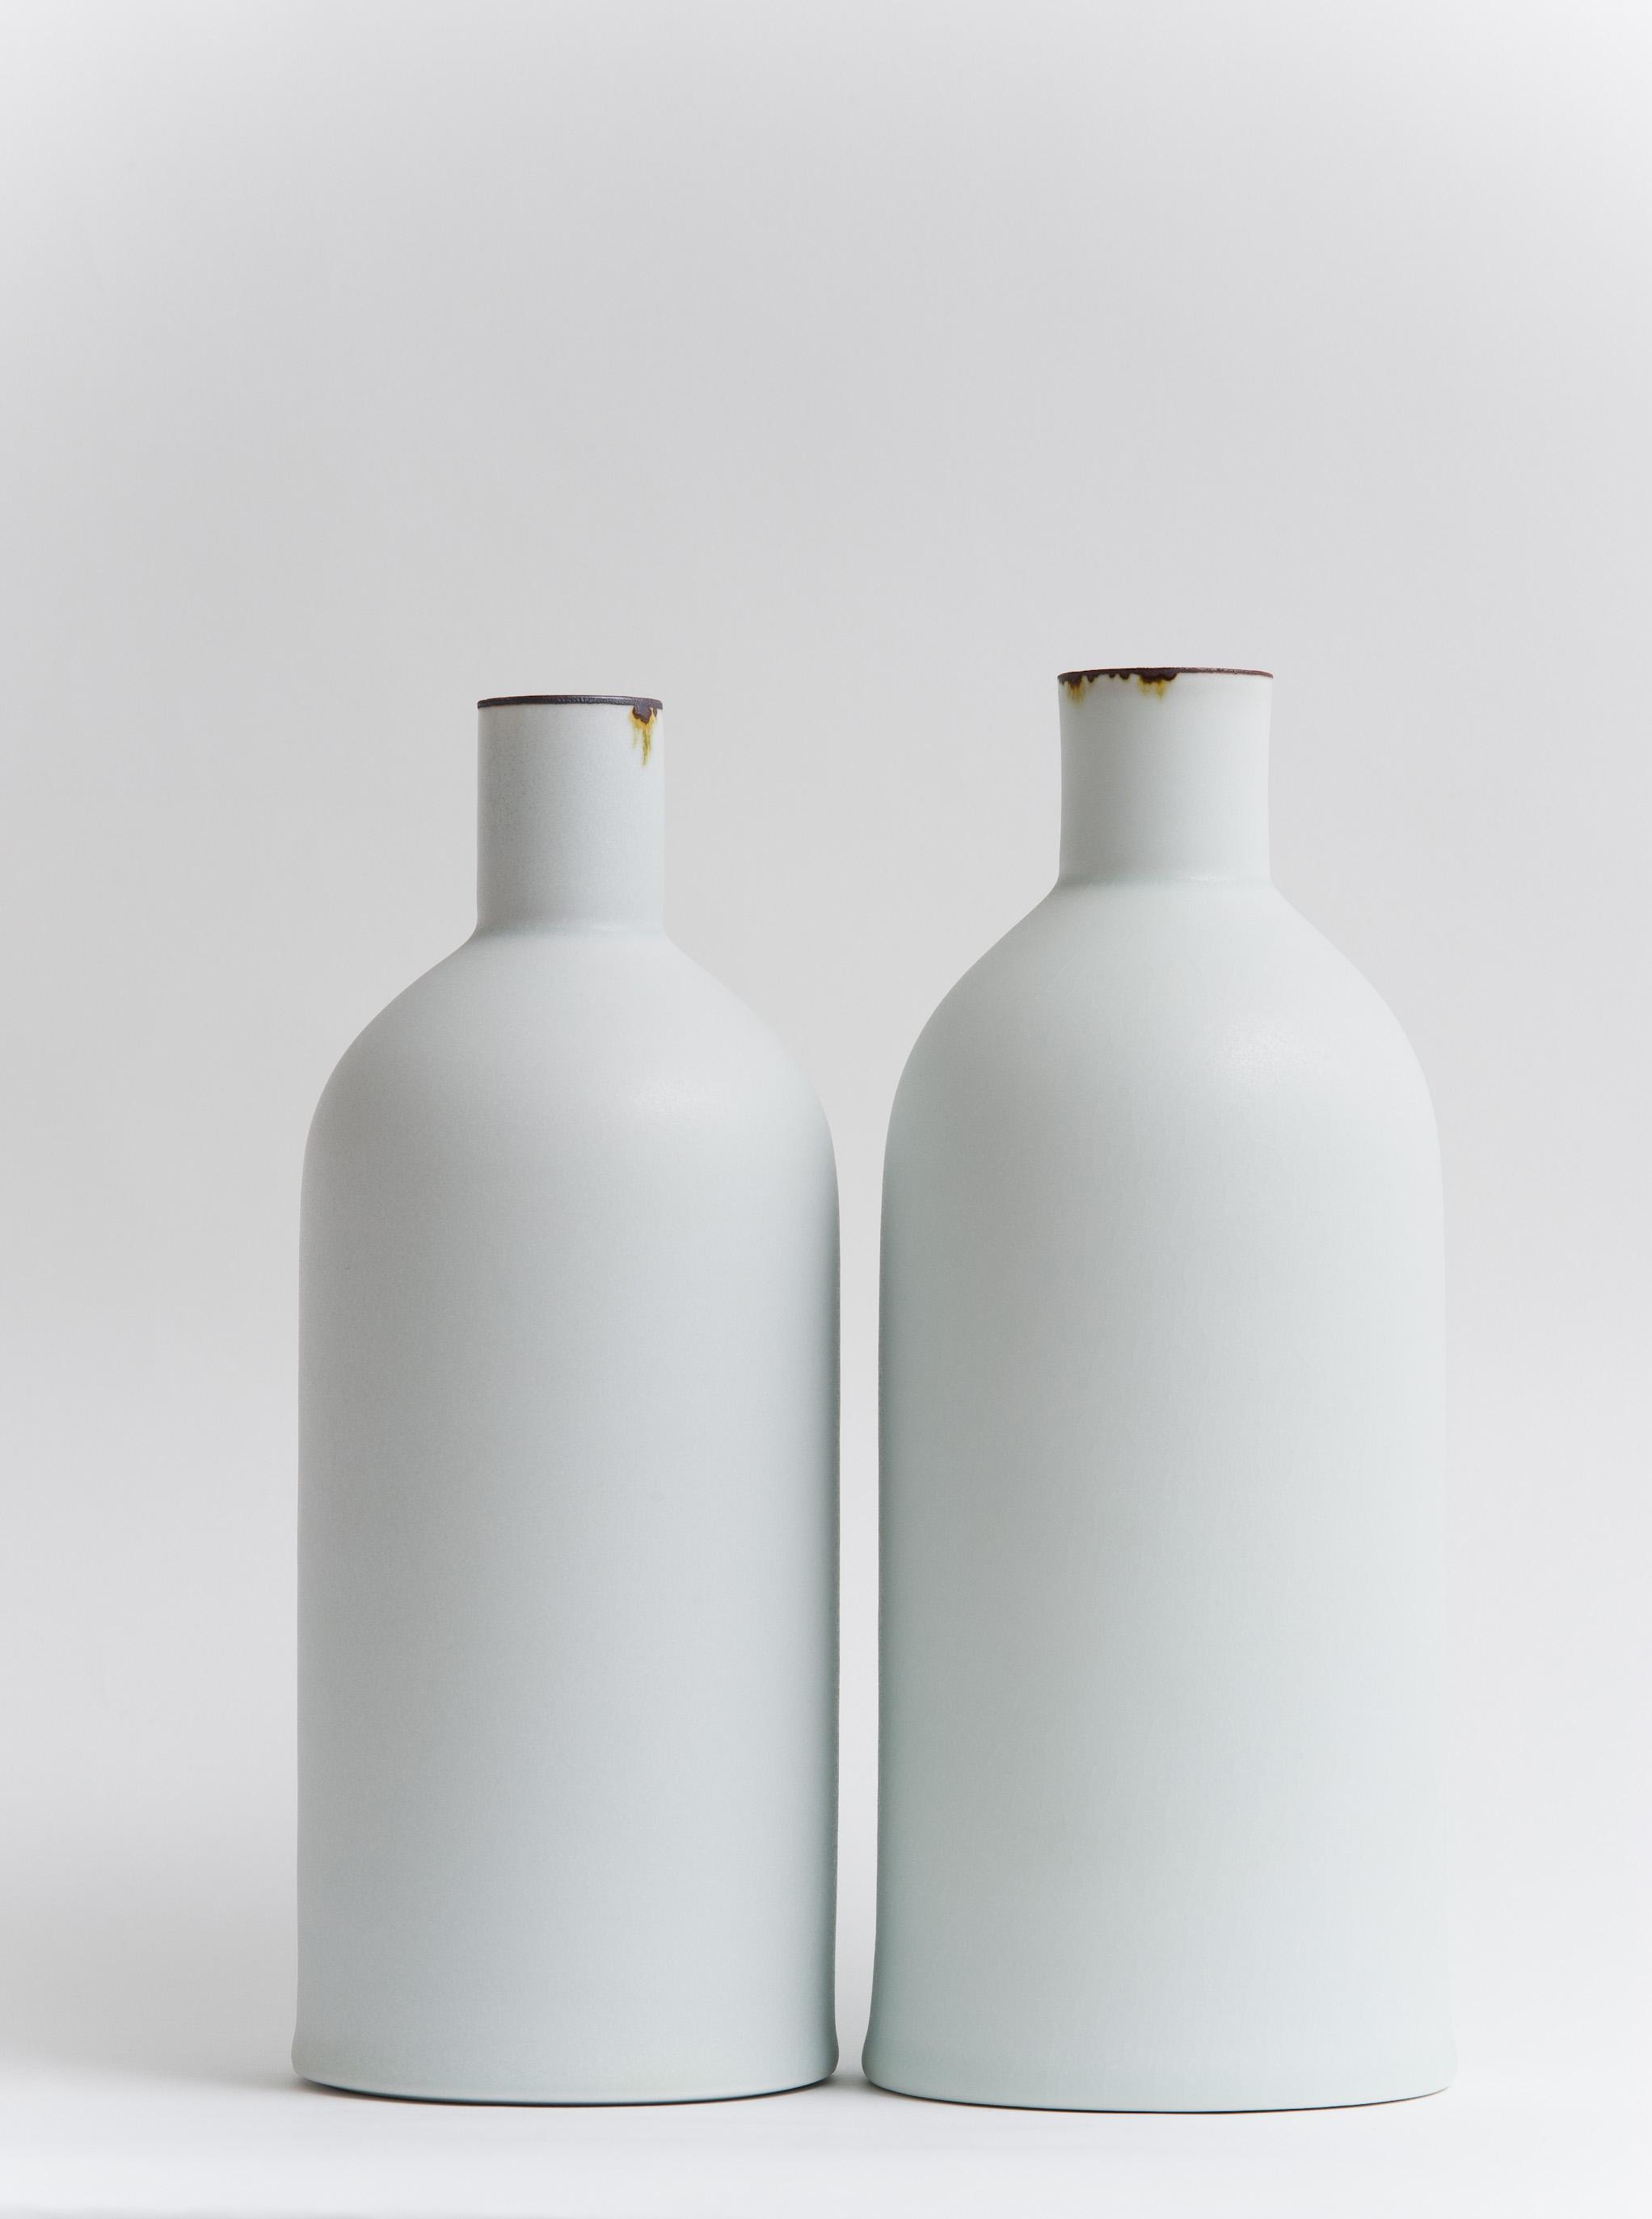 23 Pair of bottles 2012.jpg